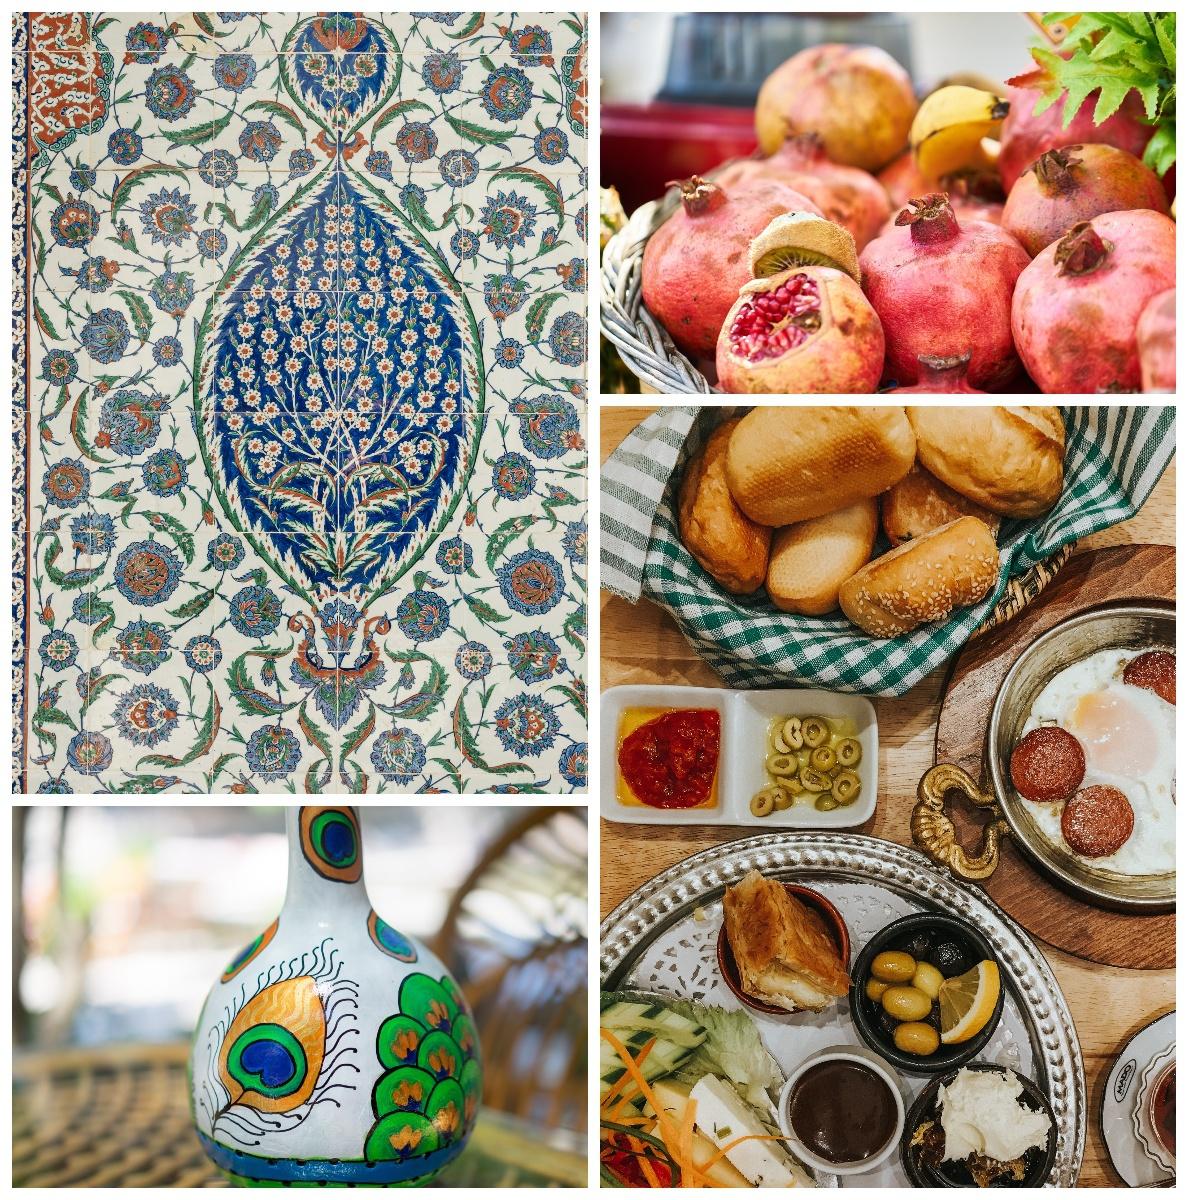 Bodrum - turecki kurort o wielu twarzach